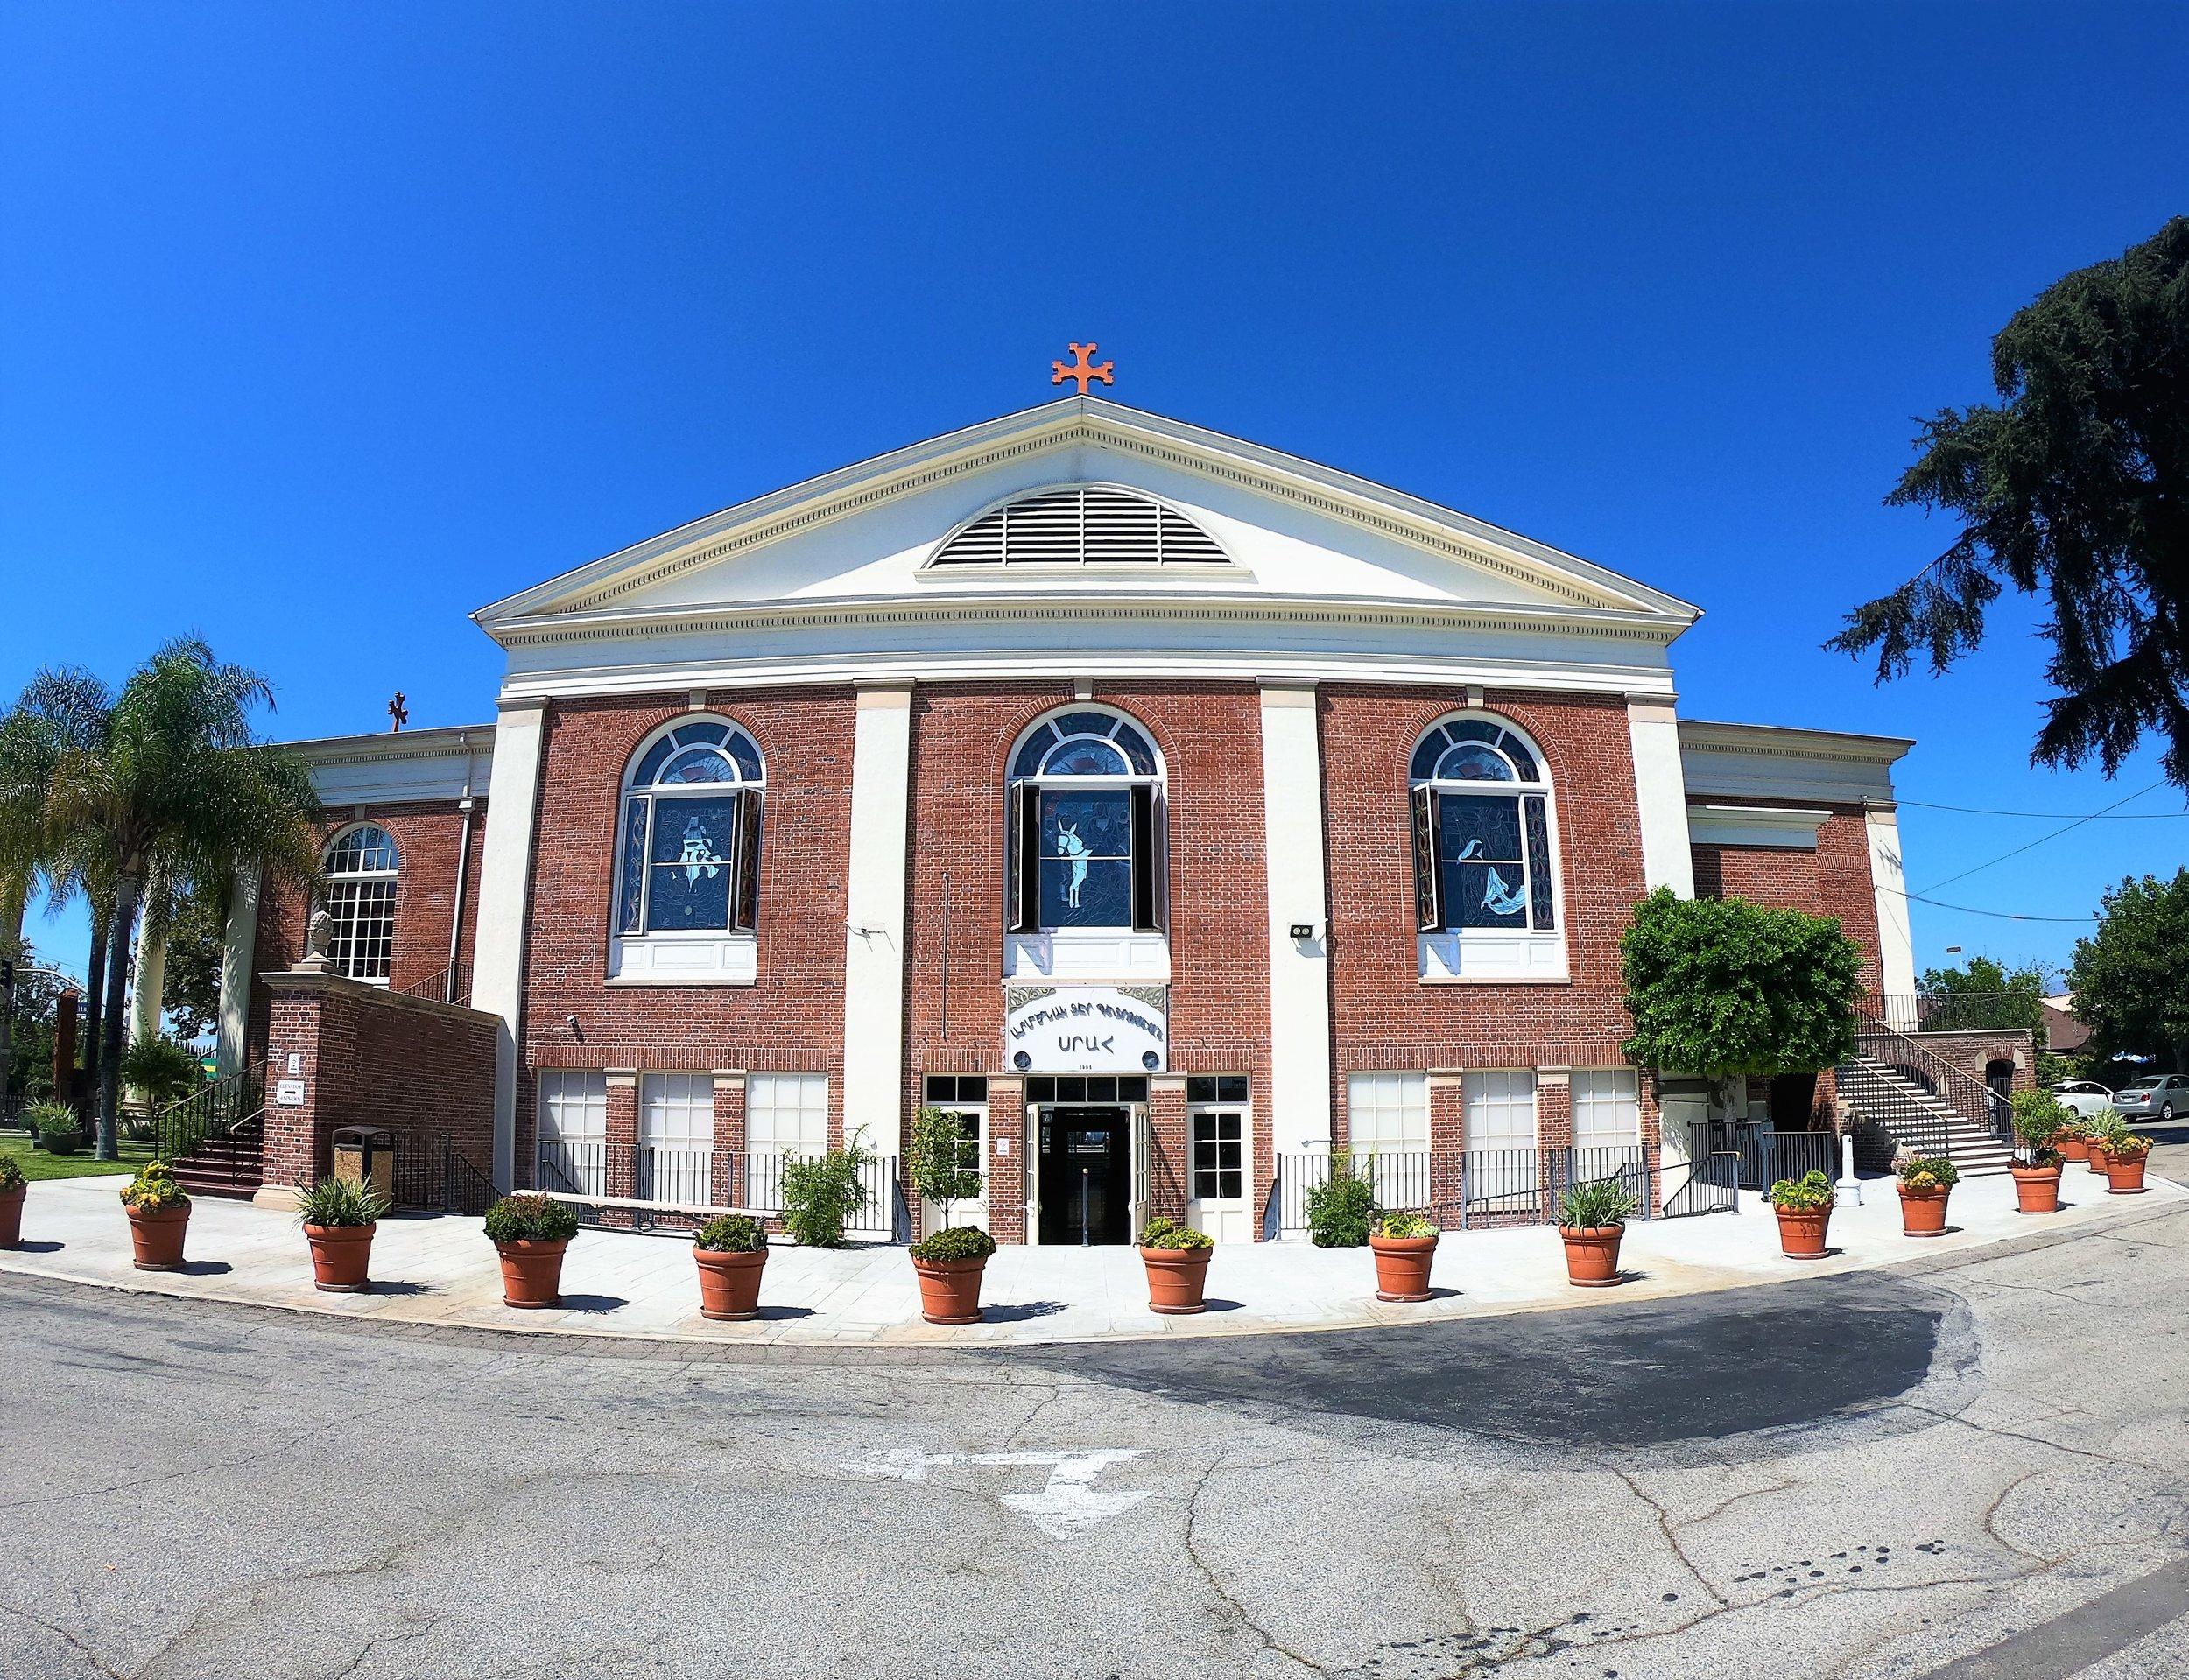 St. Mary's Armenian Apostolic Church in Glendale, California